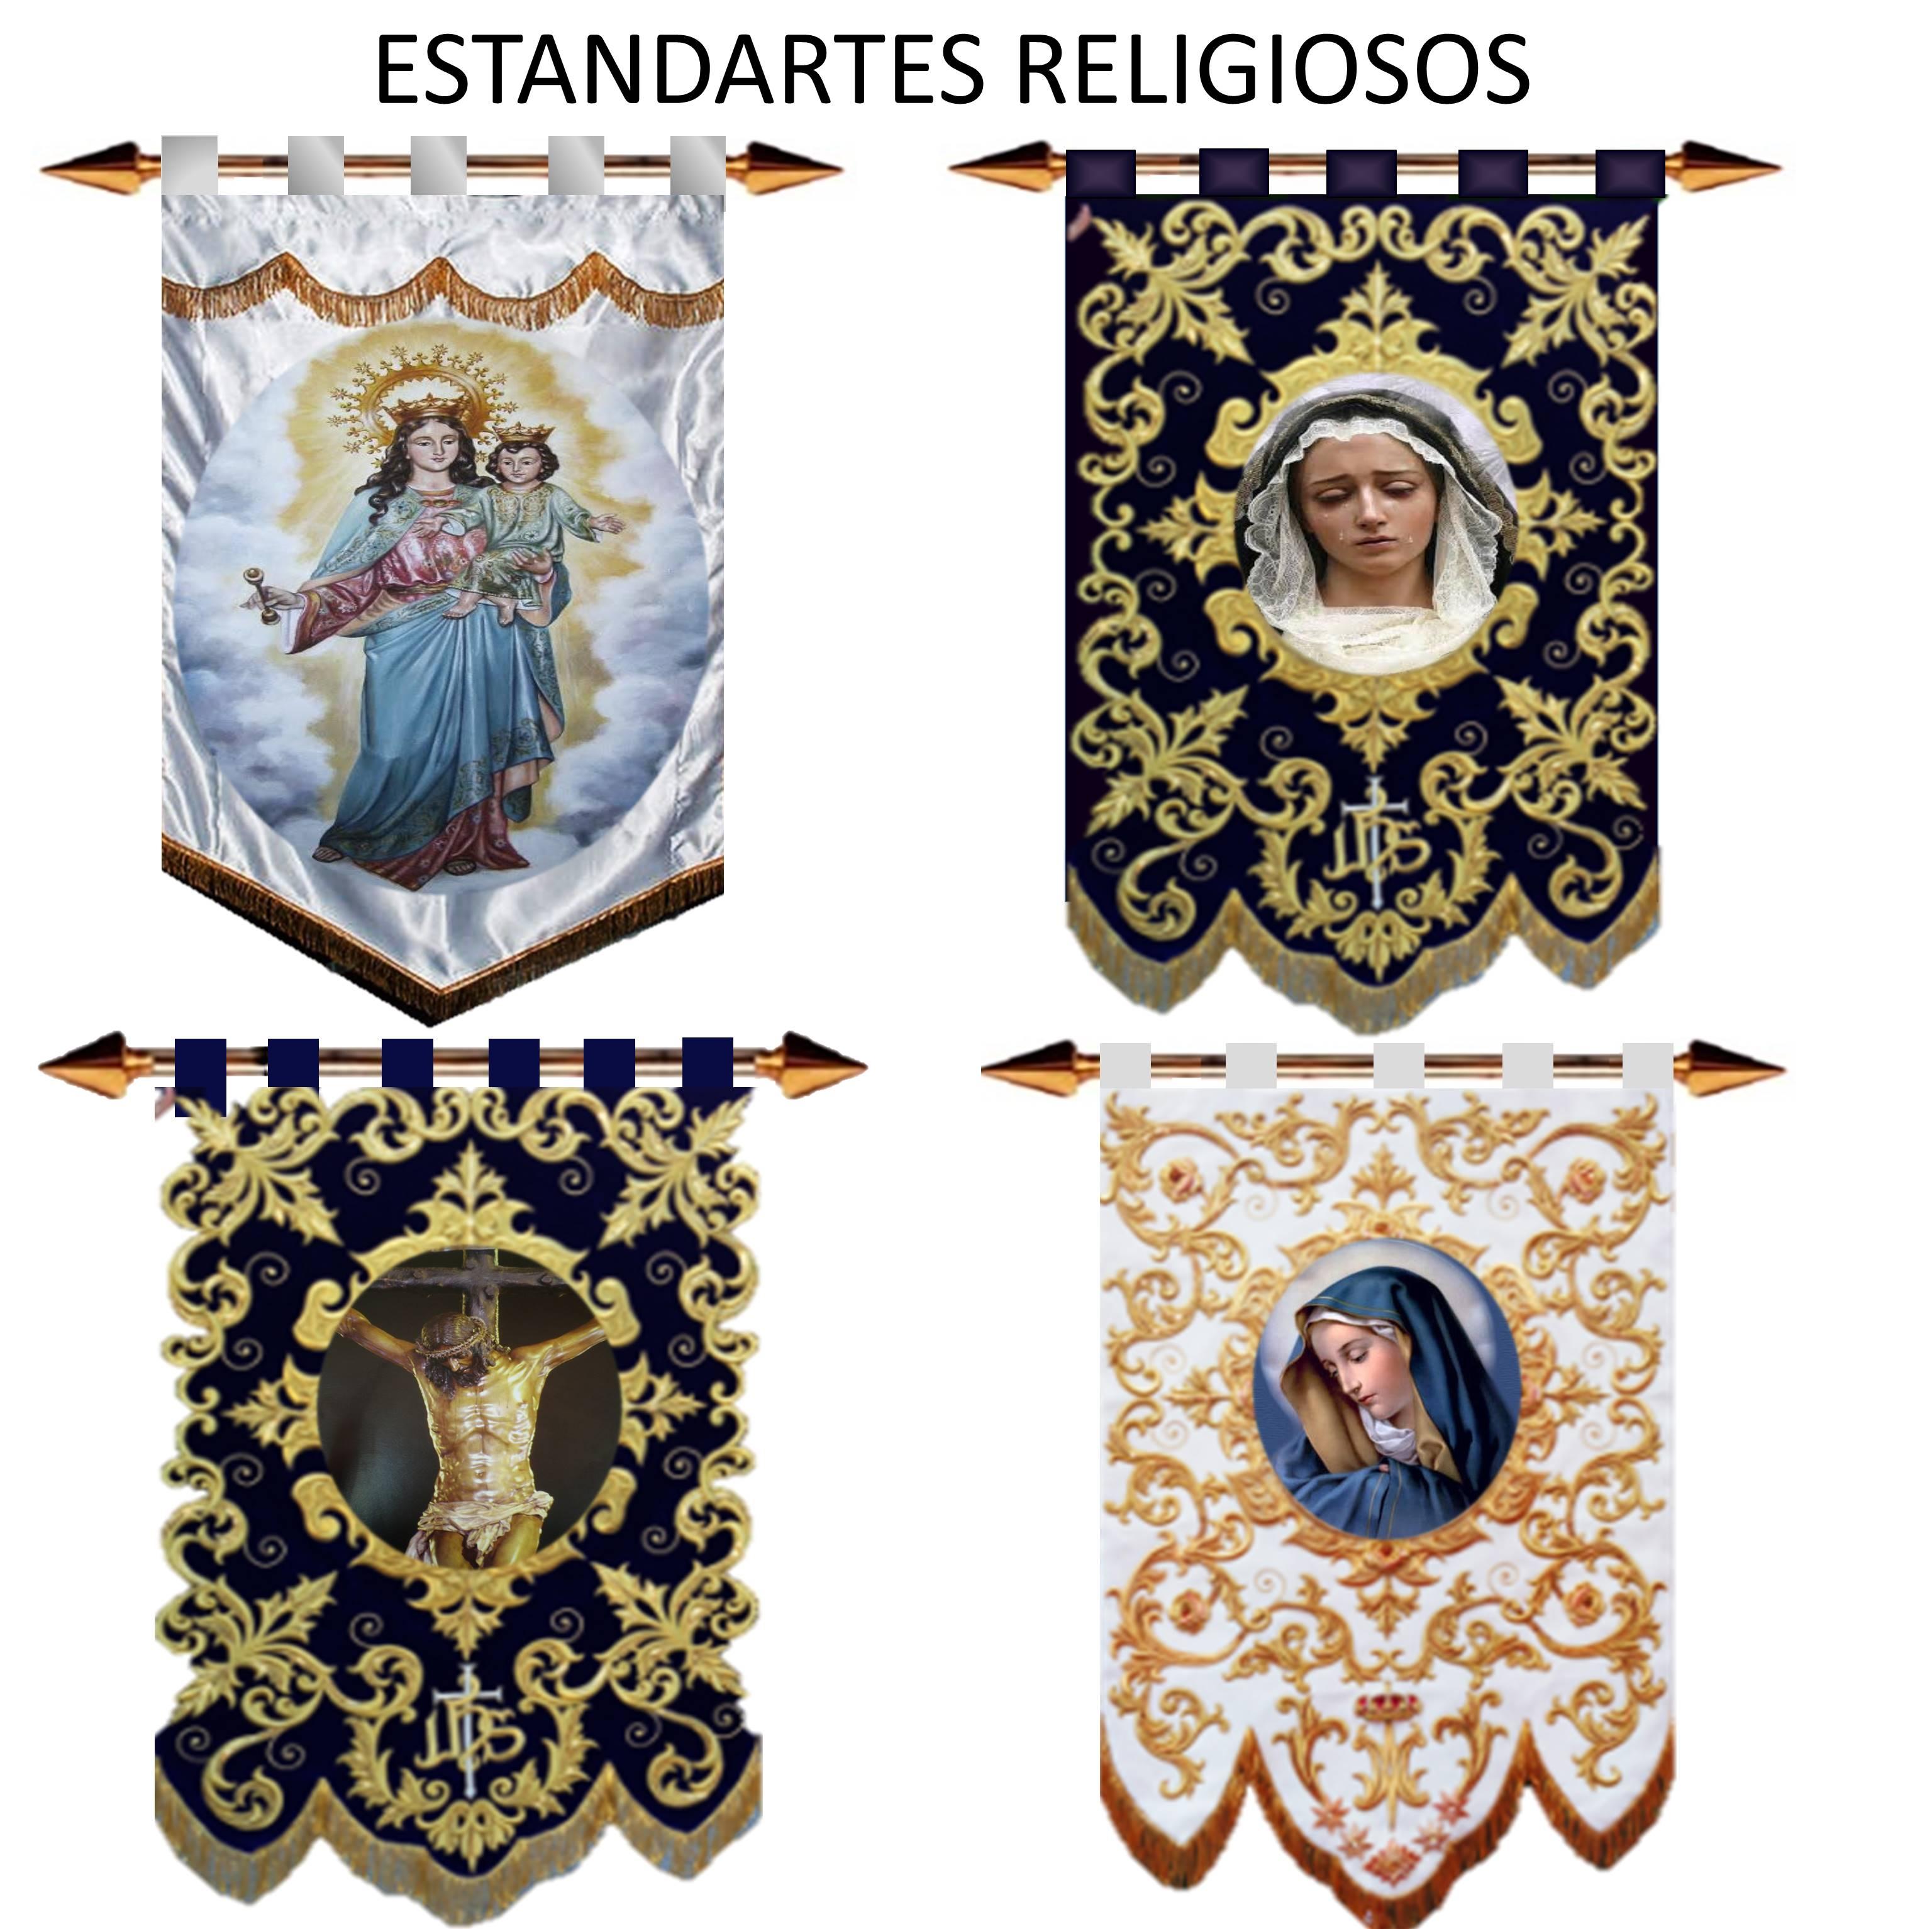 ESTANDARTES RELIGIOSO